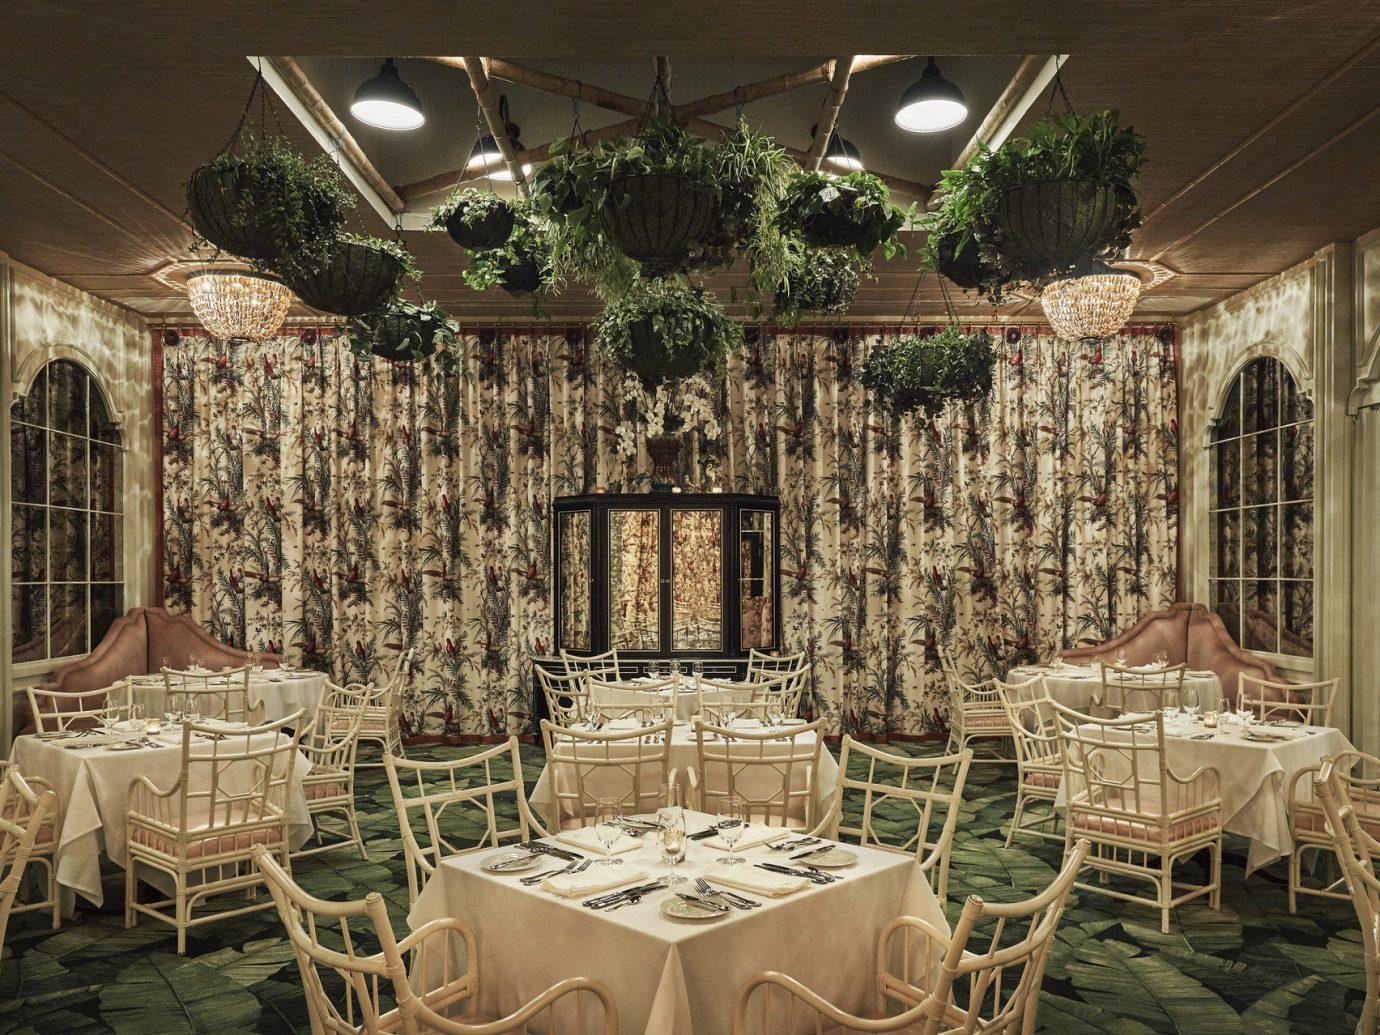 Food + Drink chair room dining room function hall estate wedding meal banquet ceremony restaurant mansion wedding reception aisle interior design ballroom palace furniture